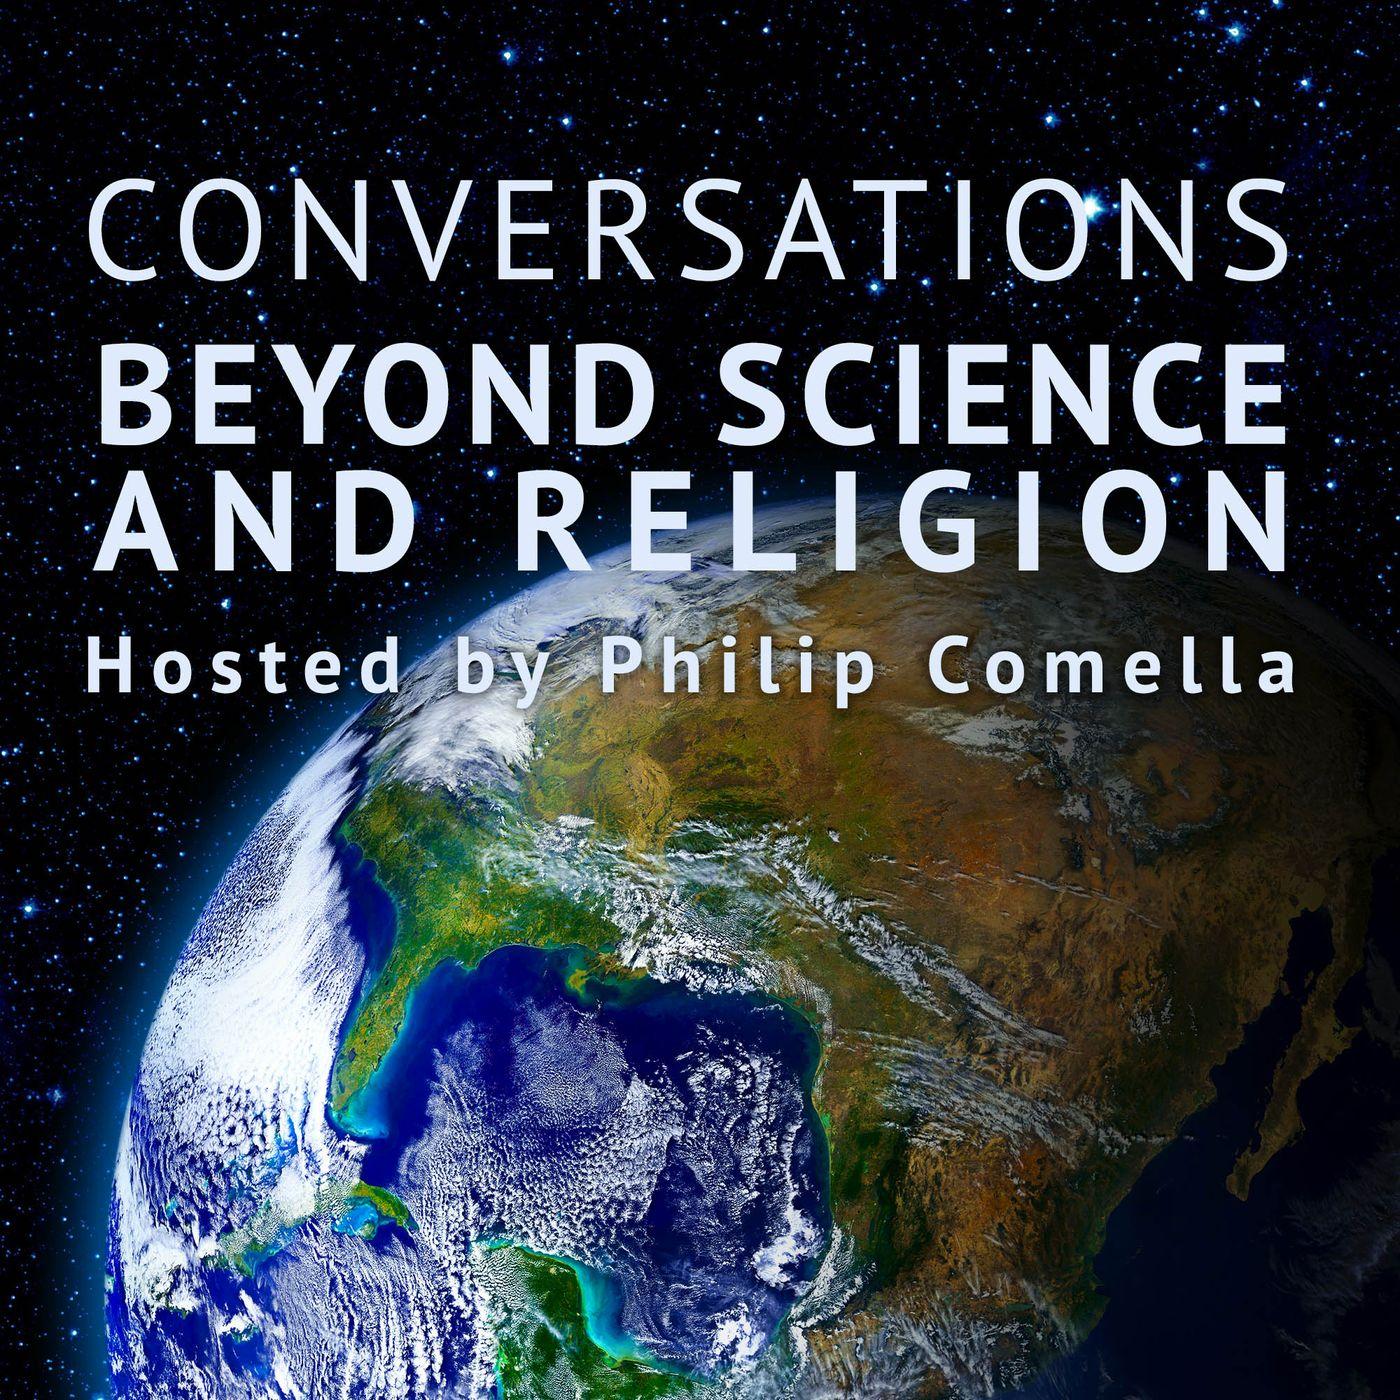 Conversations Beyond Science & Religion